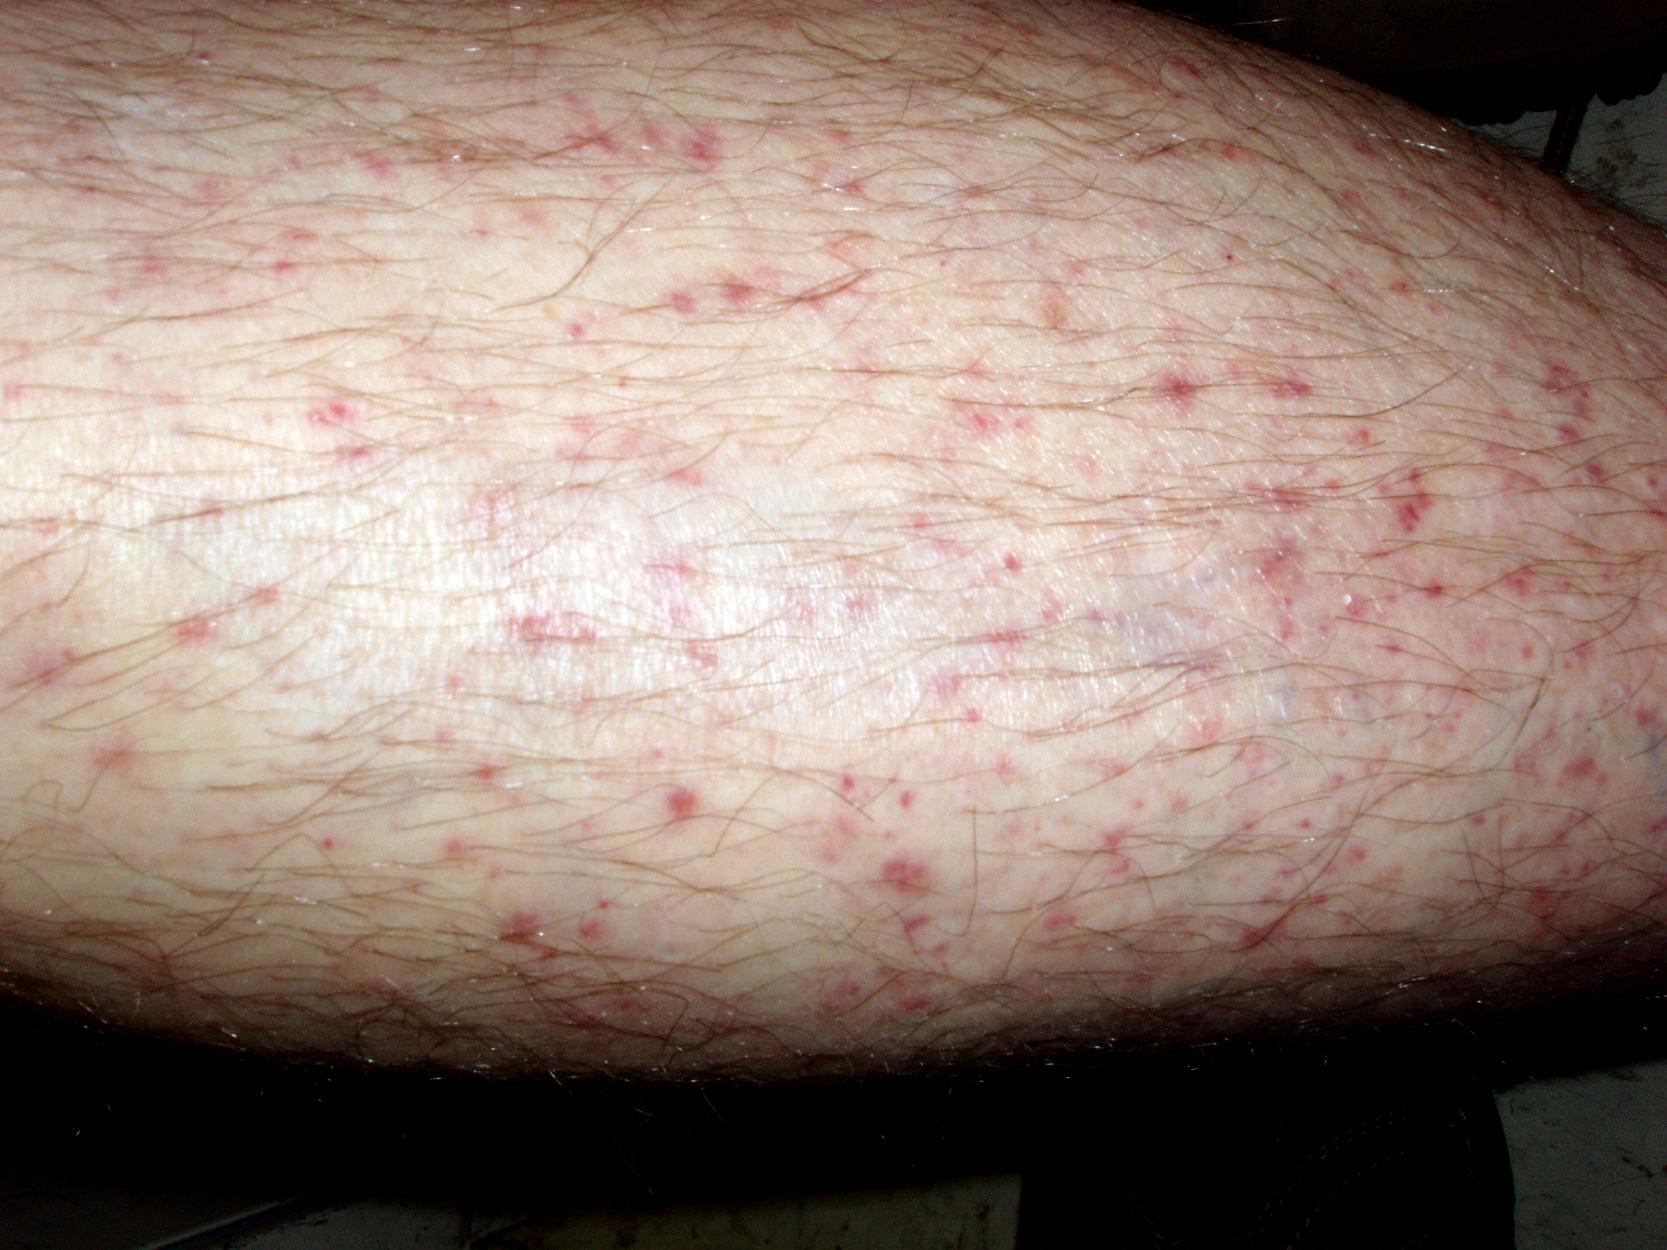 Vasculitis and lupus | National Resource Center on Lupus